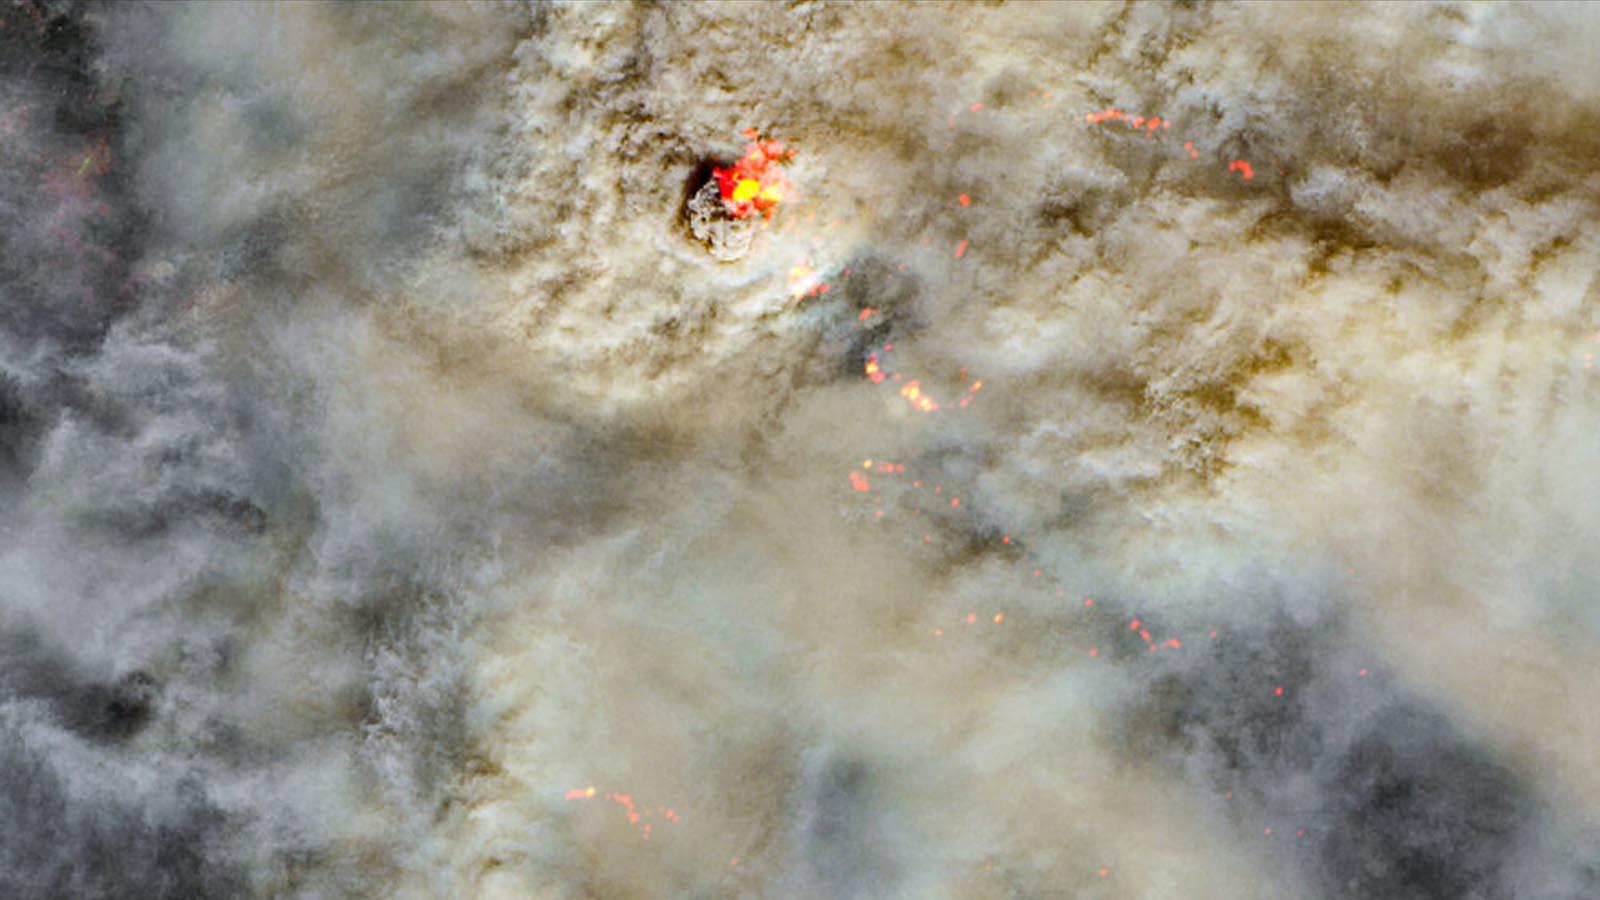 August Complex Fire